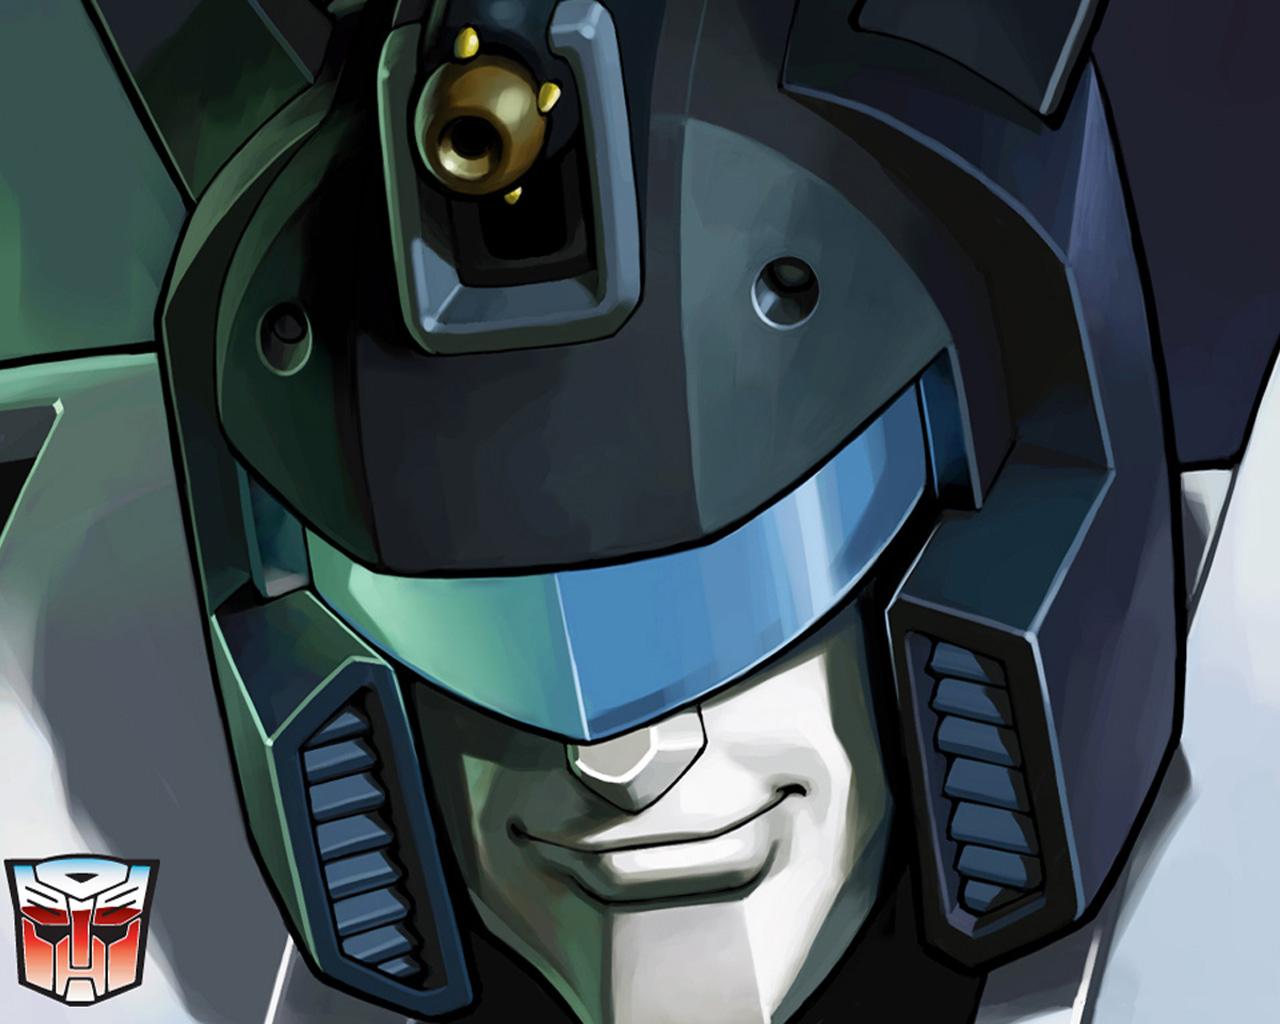 G1 Autobots Wallpaper Gallery 3 1280 X 1024 Pixels Digital Citizen